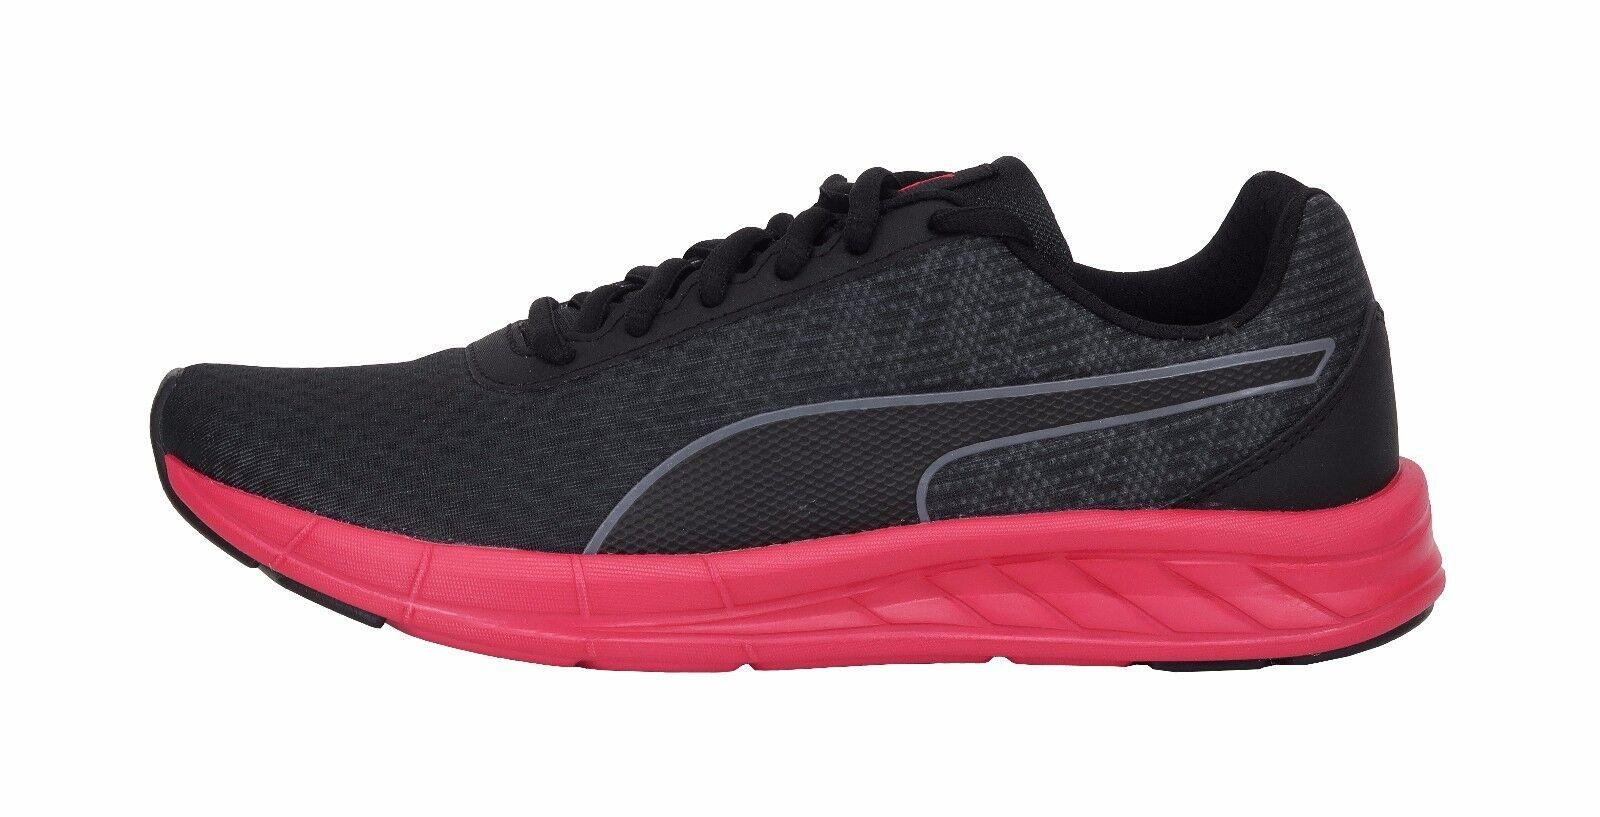 Puma Ligero Zapatos Mujer Cometa Negro Rojo Carbón Ligero Puma Correr Malla 8c8f48